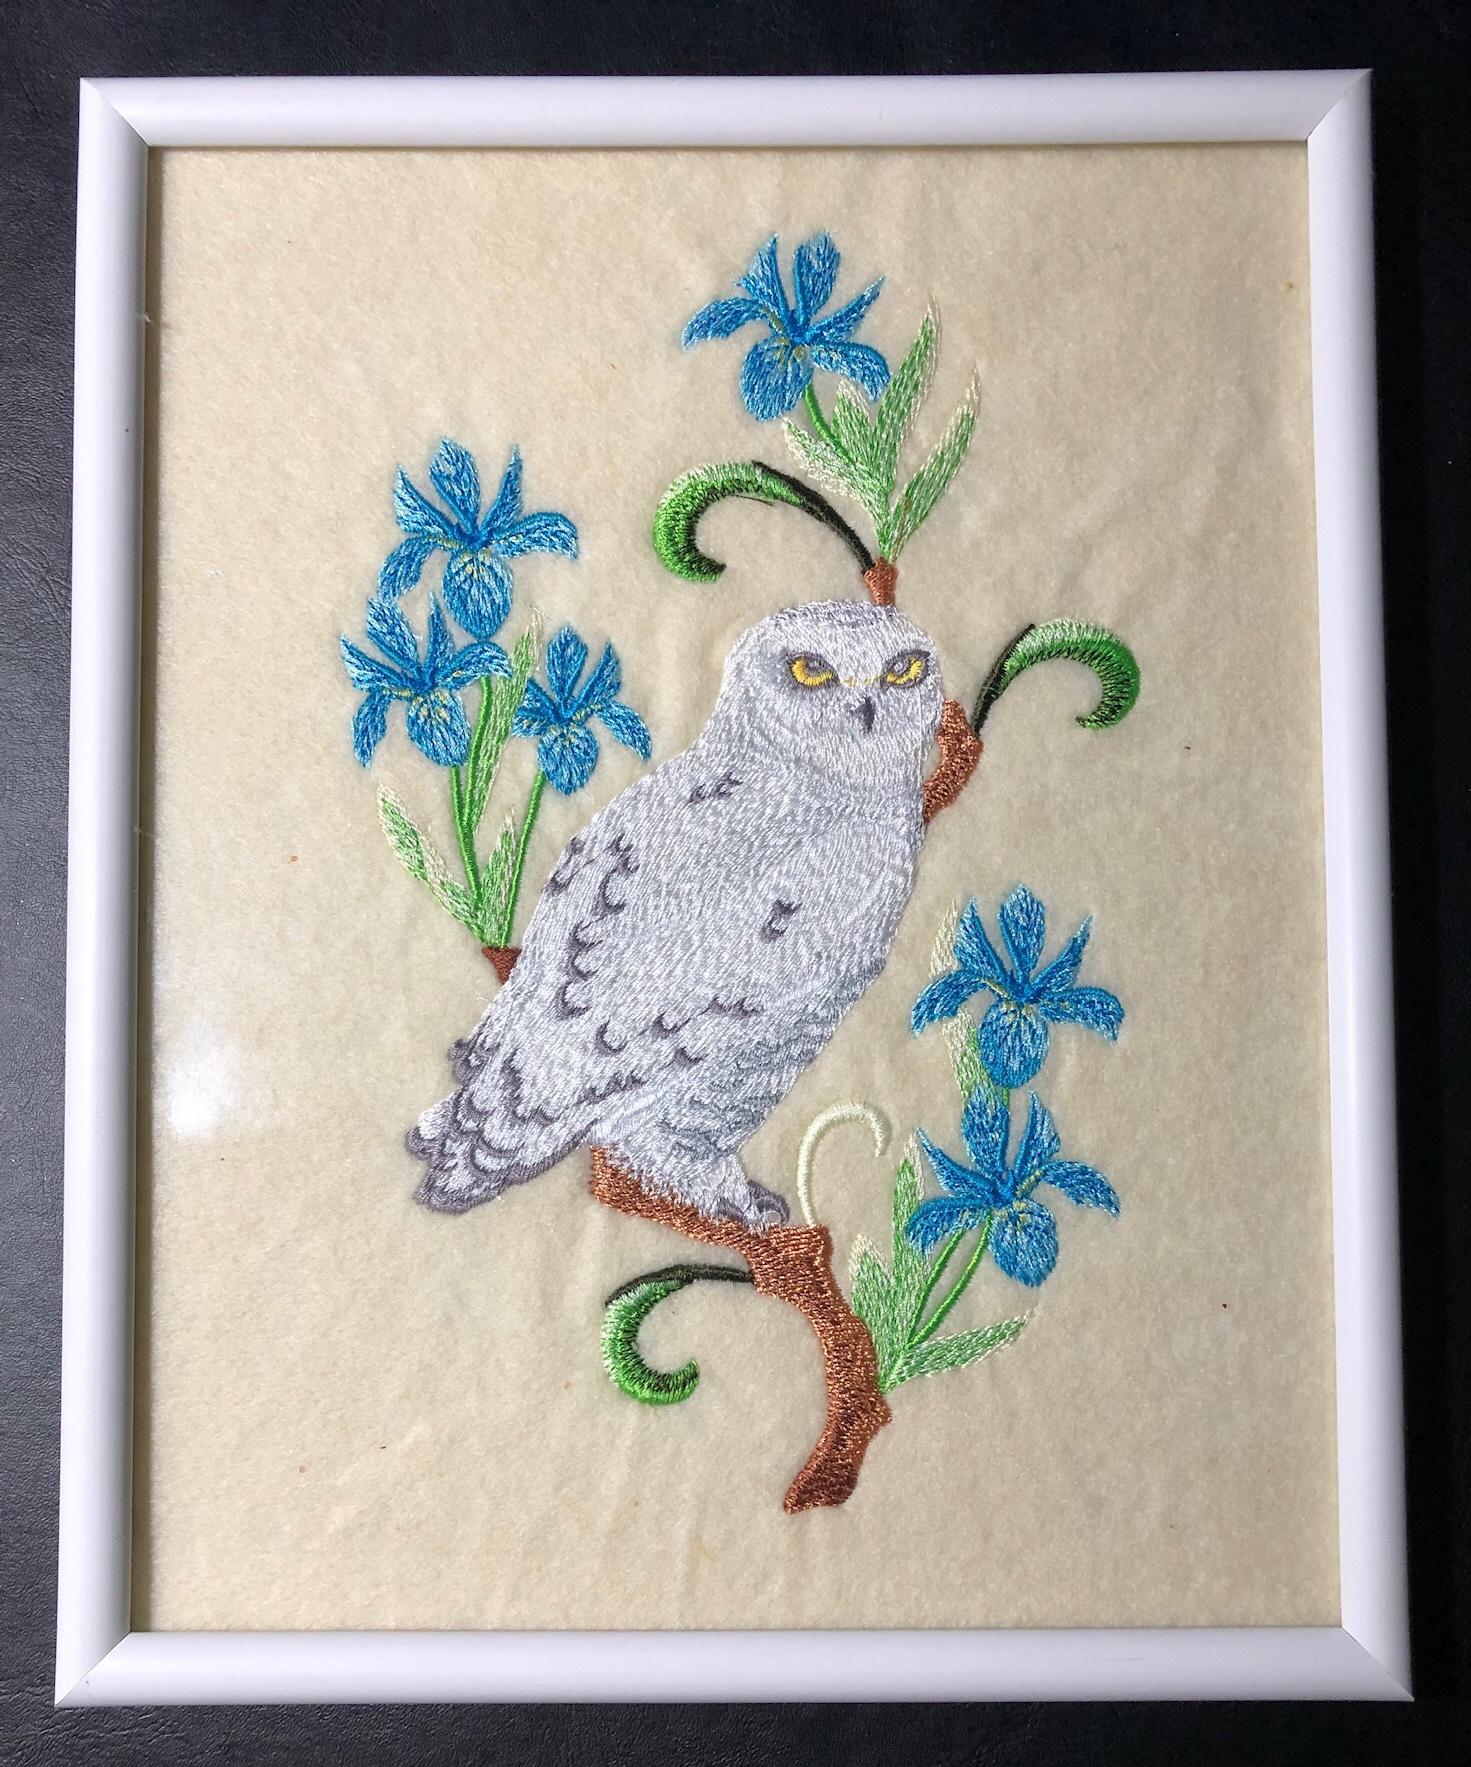 Embroidery/E2C591B4-2C8C-40CC-B87B-5B718F58A2AD.jpeg